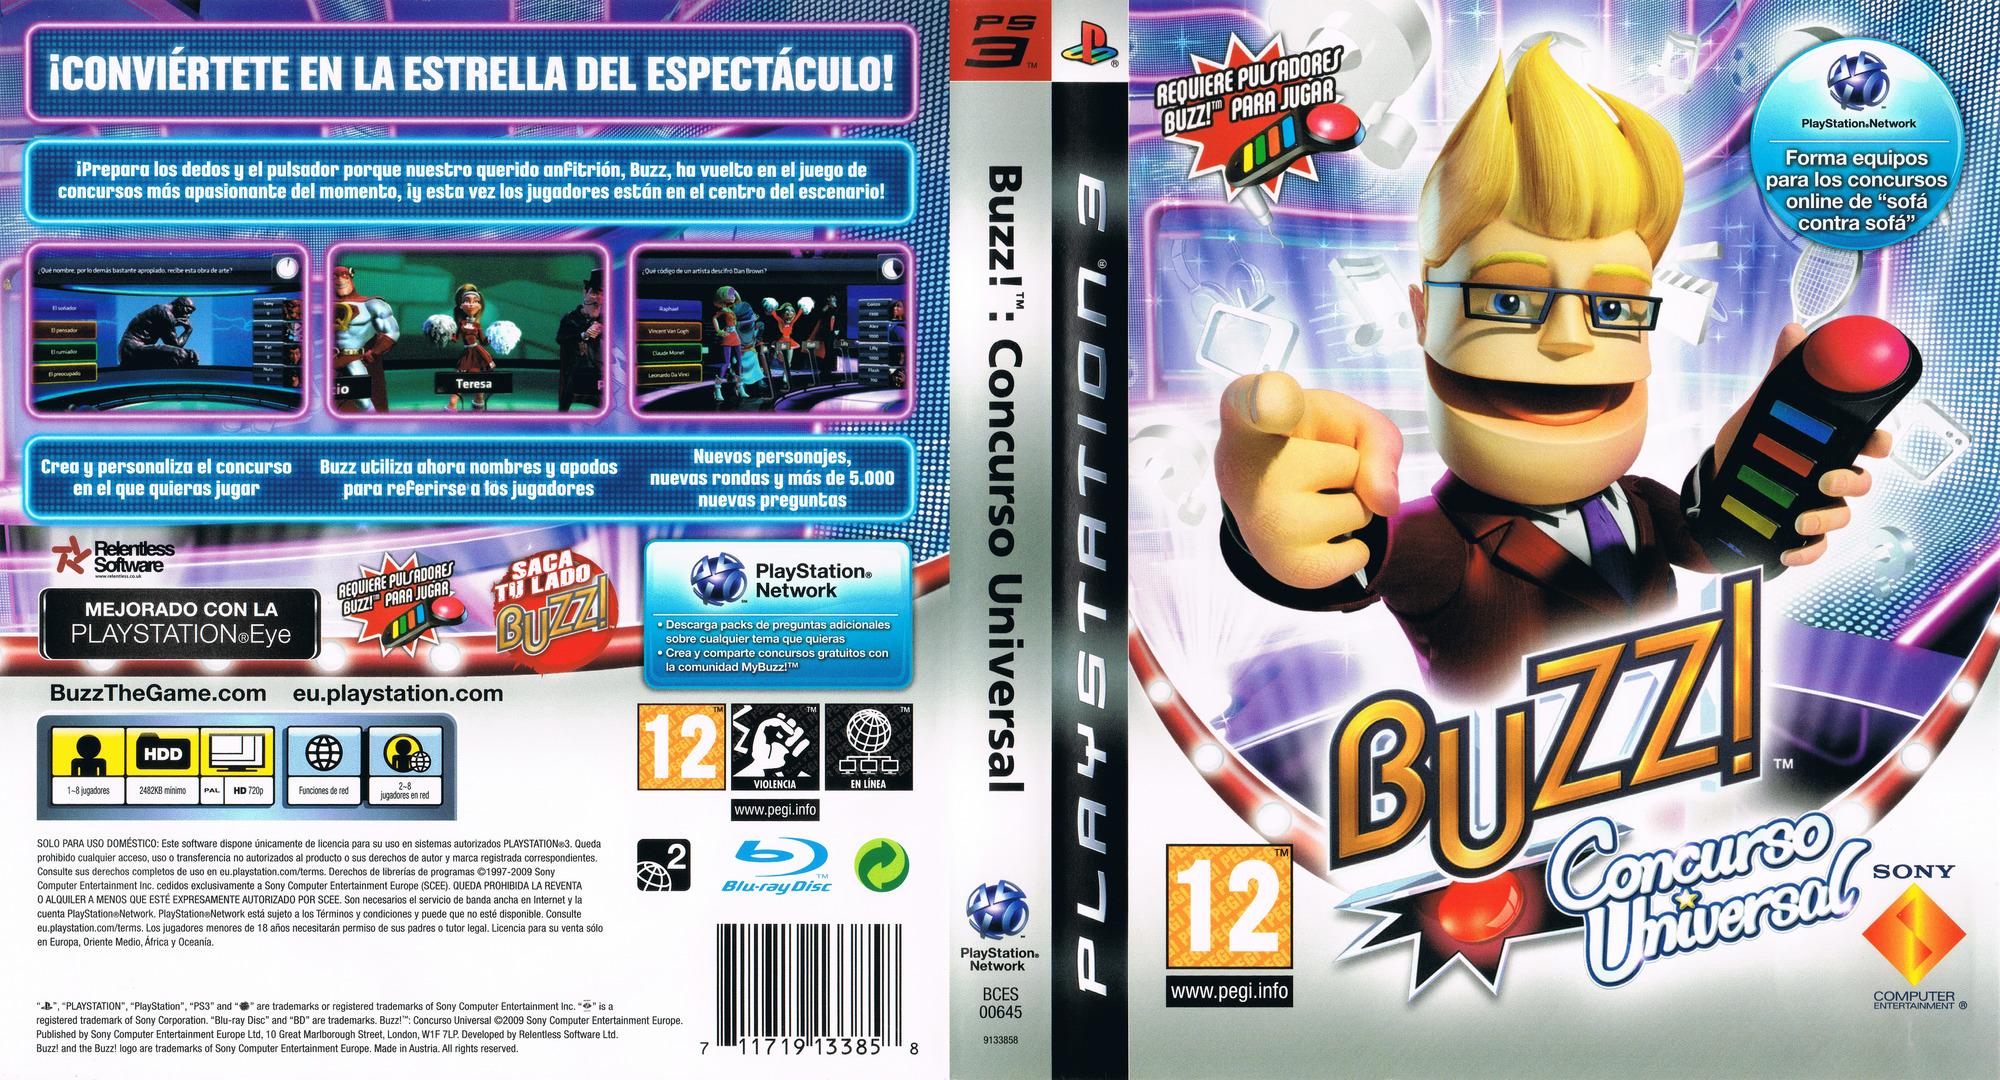 Buzz! Concurso Universal PS3 coverfullHQ (BCES00645)